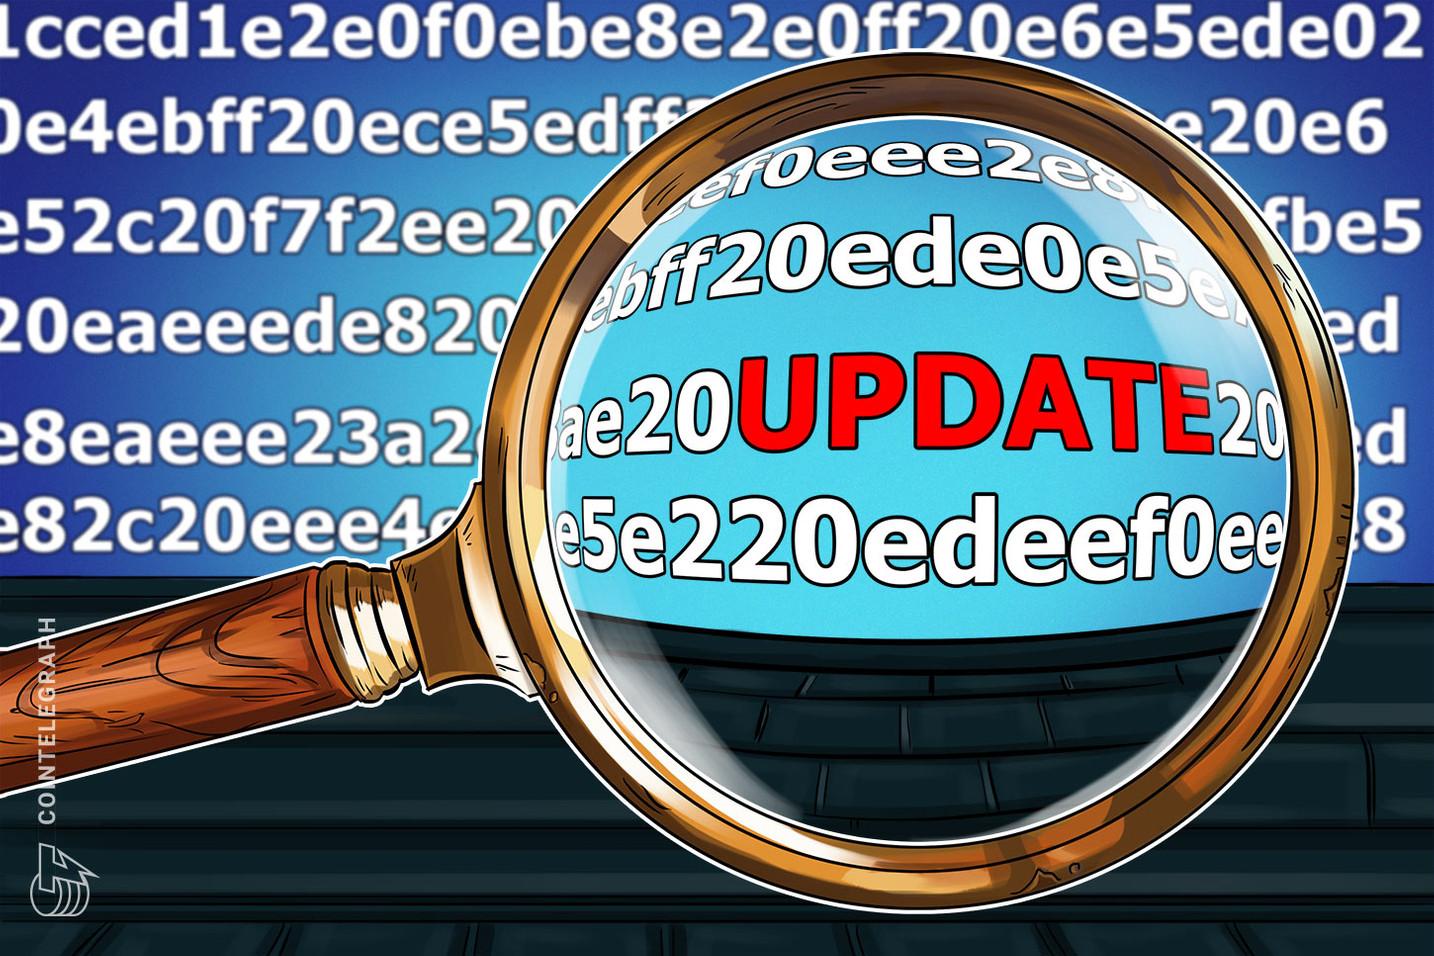 GateHub warnt vor Phishing-Betrug: Ripple-Wallet-Nutzer im Visier